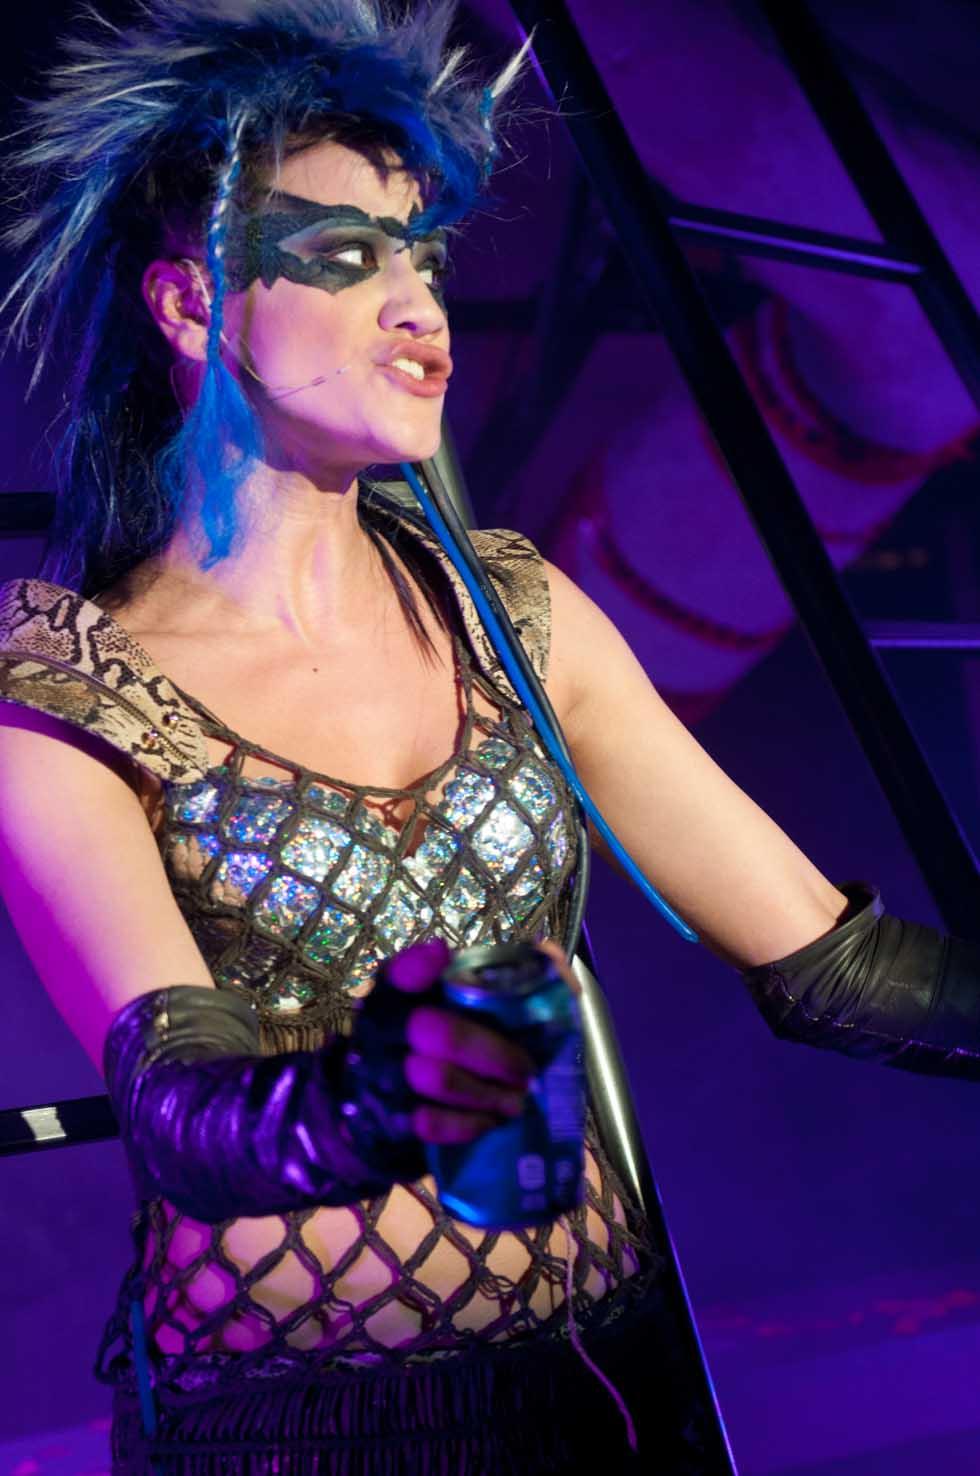 zum-schneider-nyc-2012-karneval-apocalyptika-4485.jpg